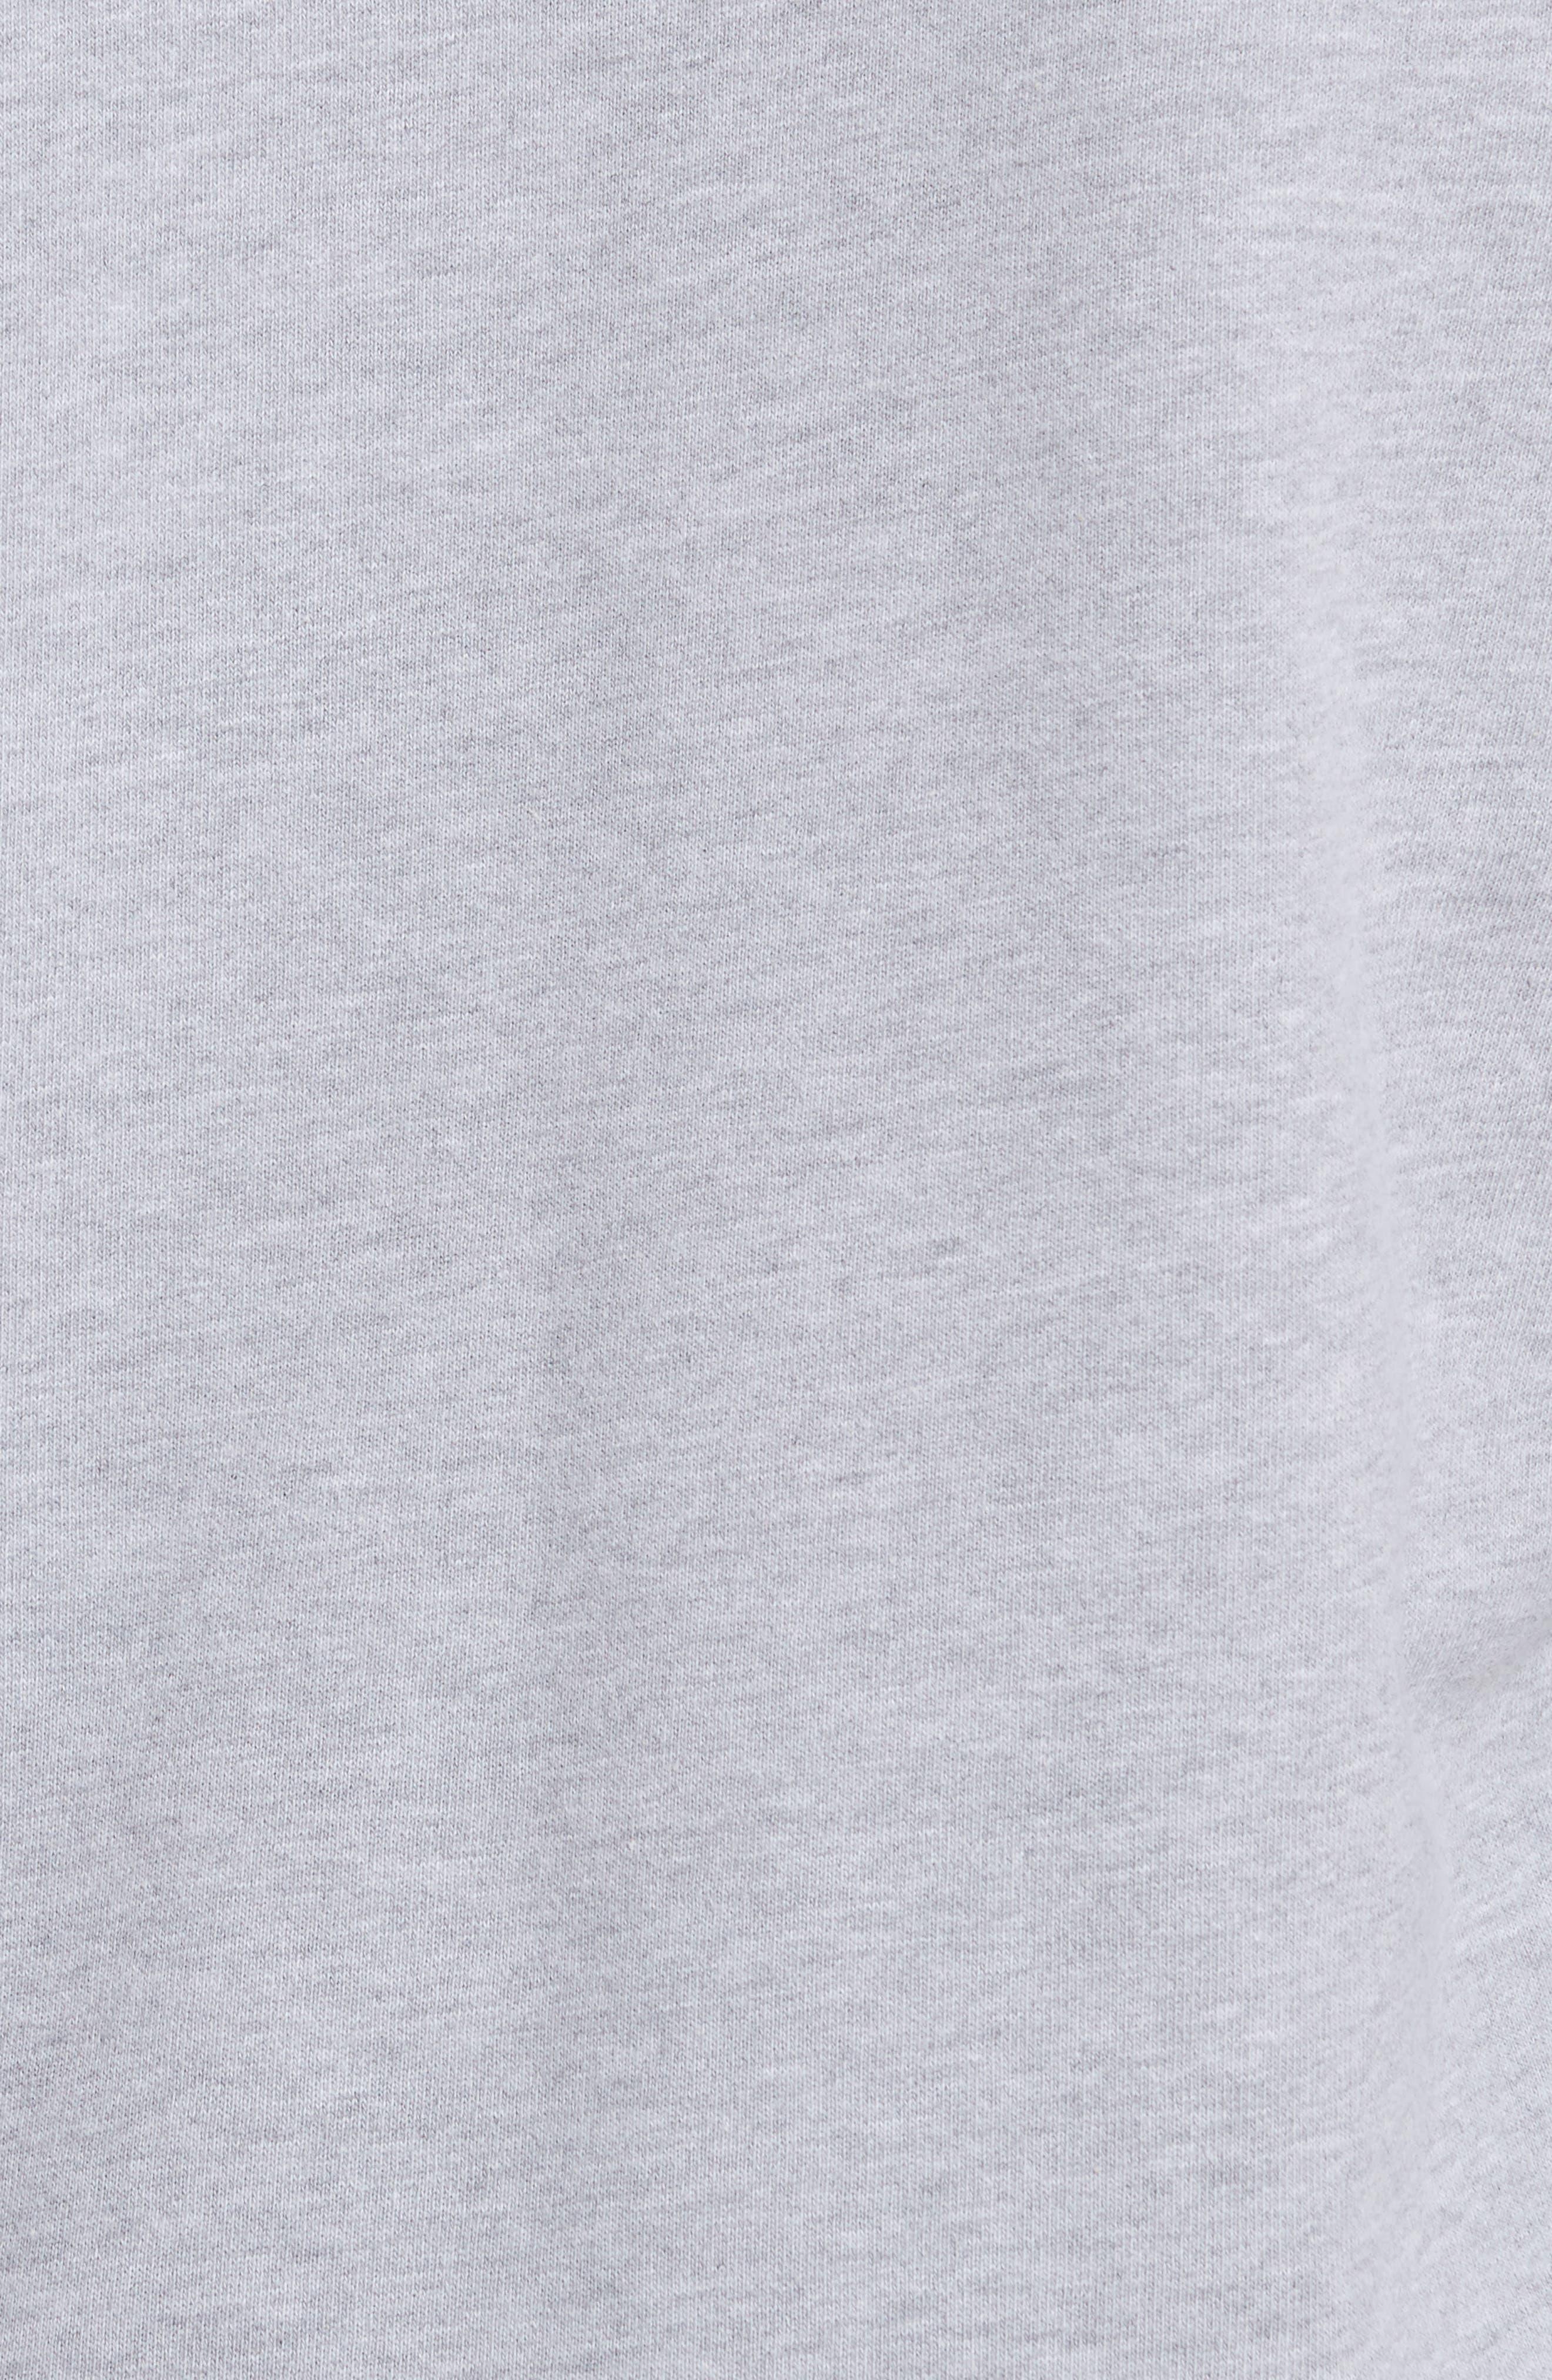 Jennings Embroidered Sweatshirt,                             Alternate thumbnail 5, color,                             Heather Grey